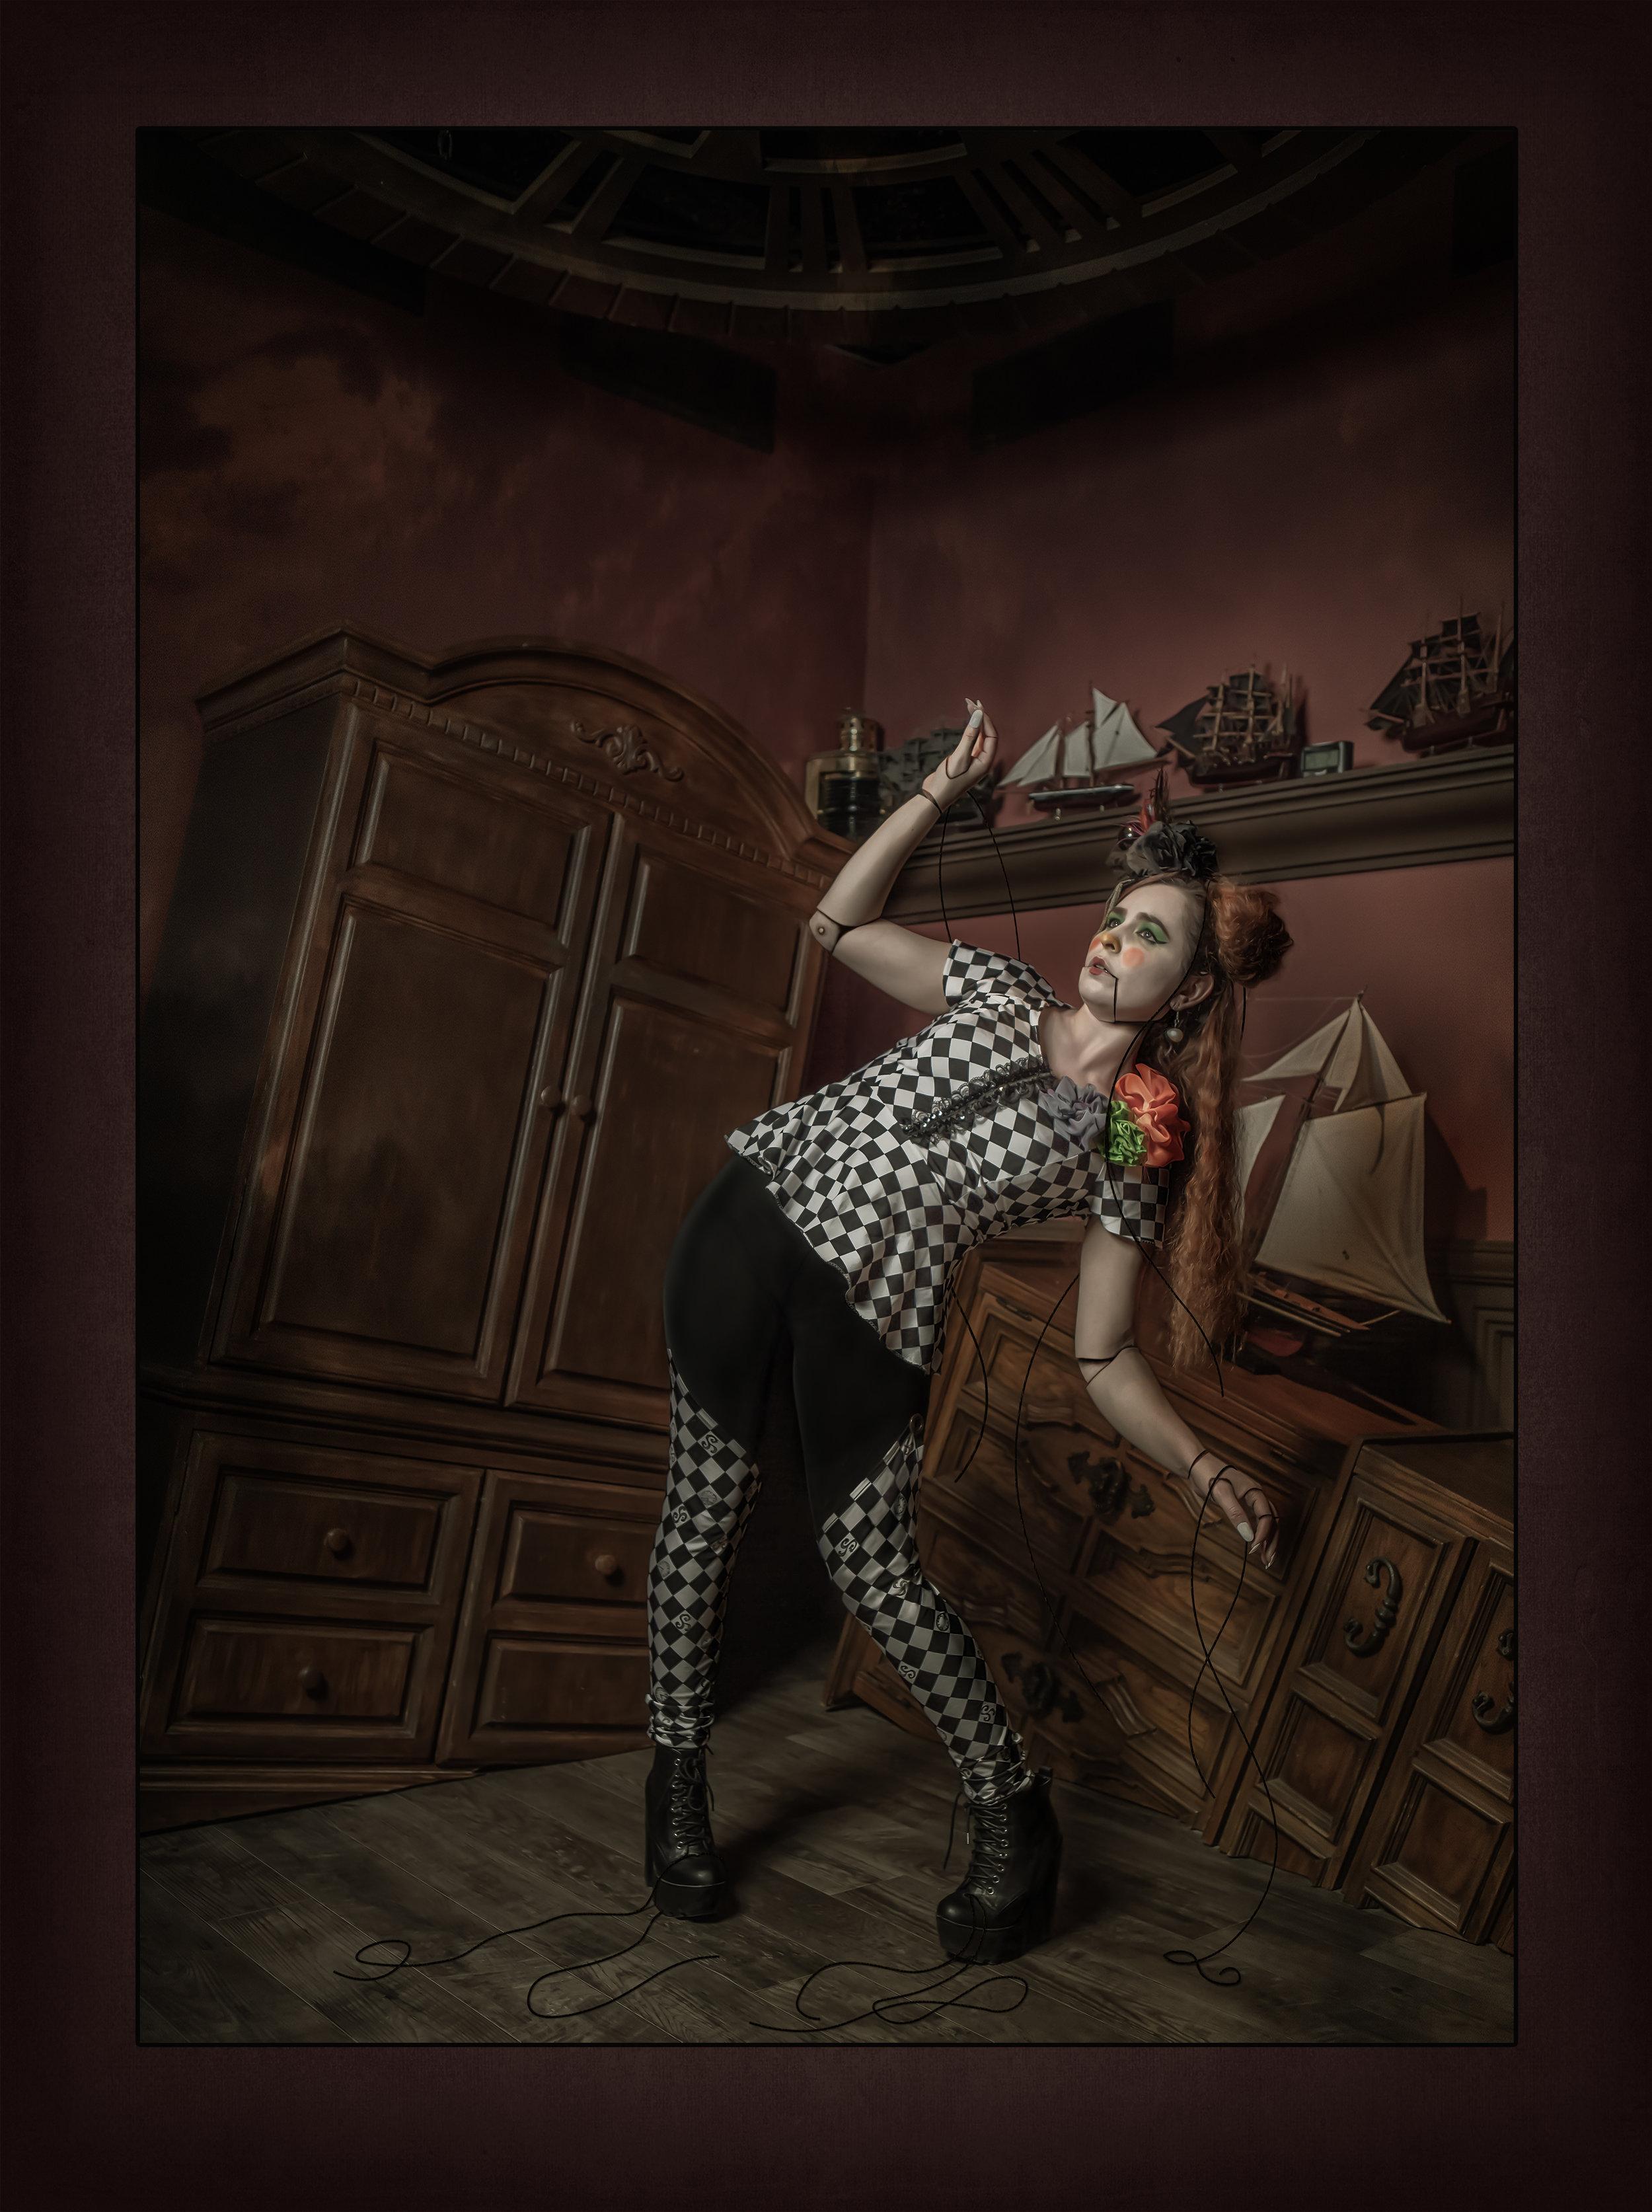 """Broken Marionette"" - 2019 International Photographic Competition Award-Winning Image"